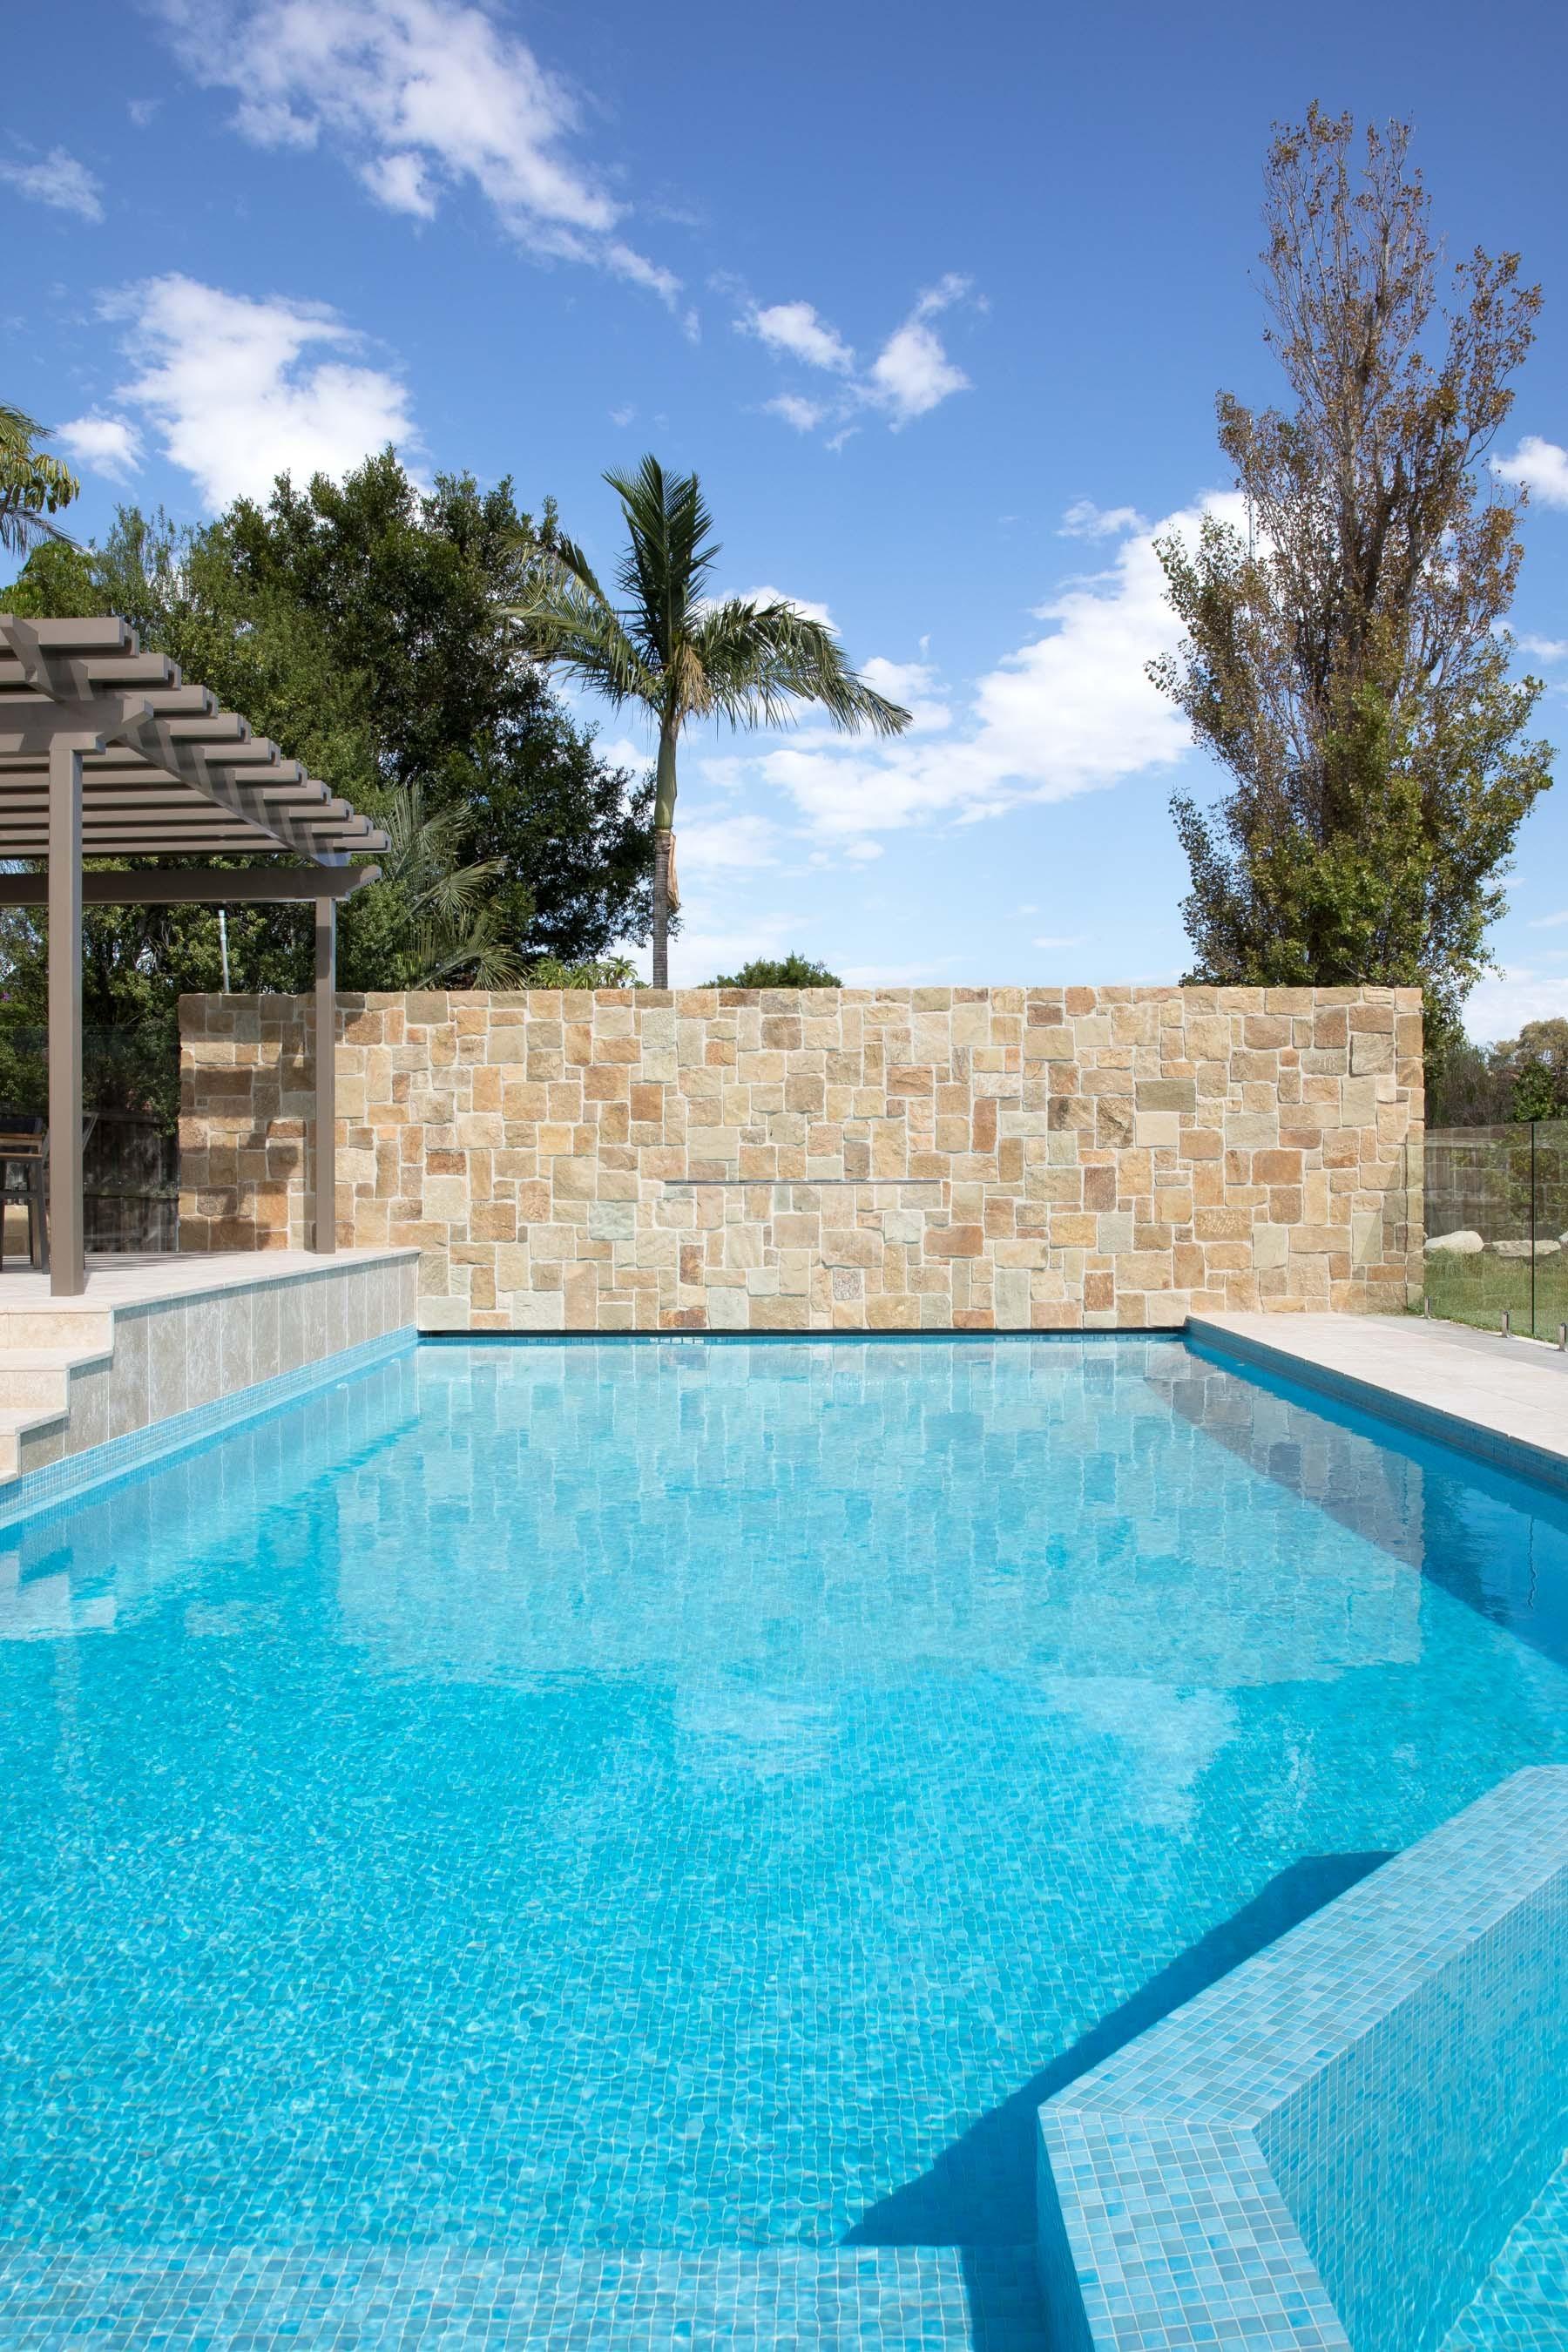 Pool-Tiles Gallery Australian hayman-03